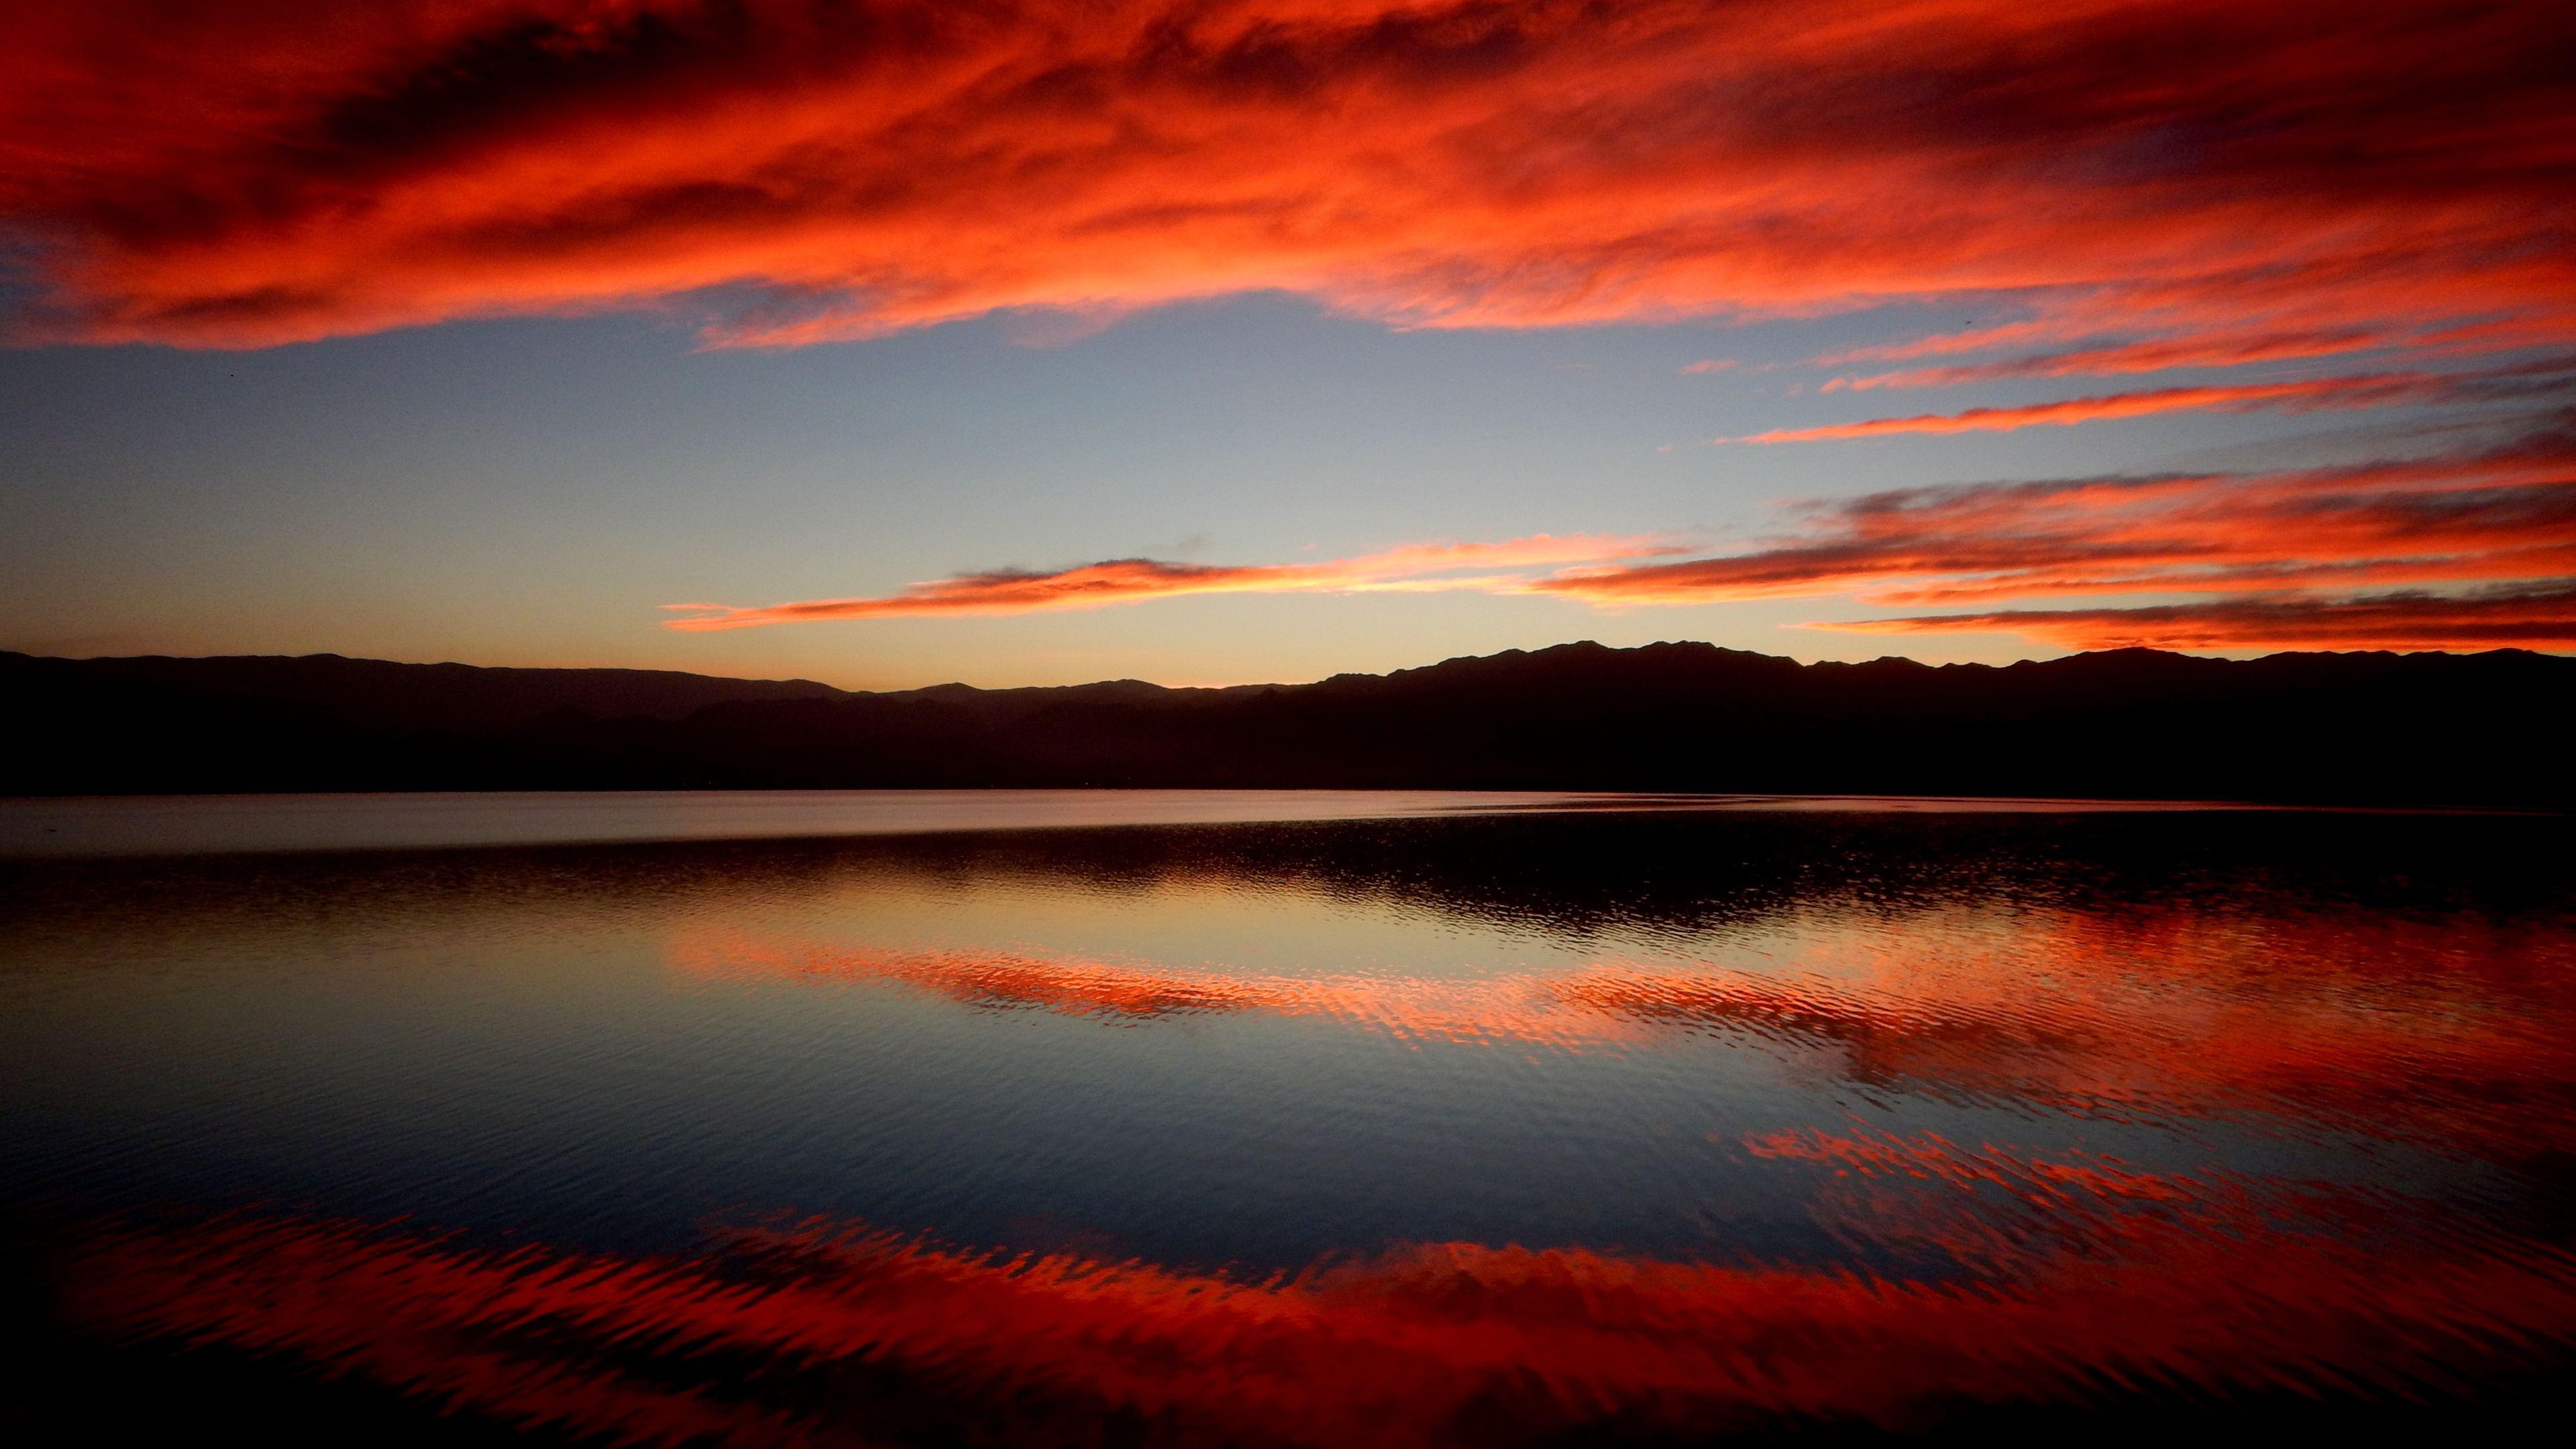 Dual Monitor Car Wallpaper Hd Sunset Reflection Beach 4k Sunset Wallpapers Reflection